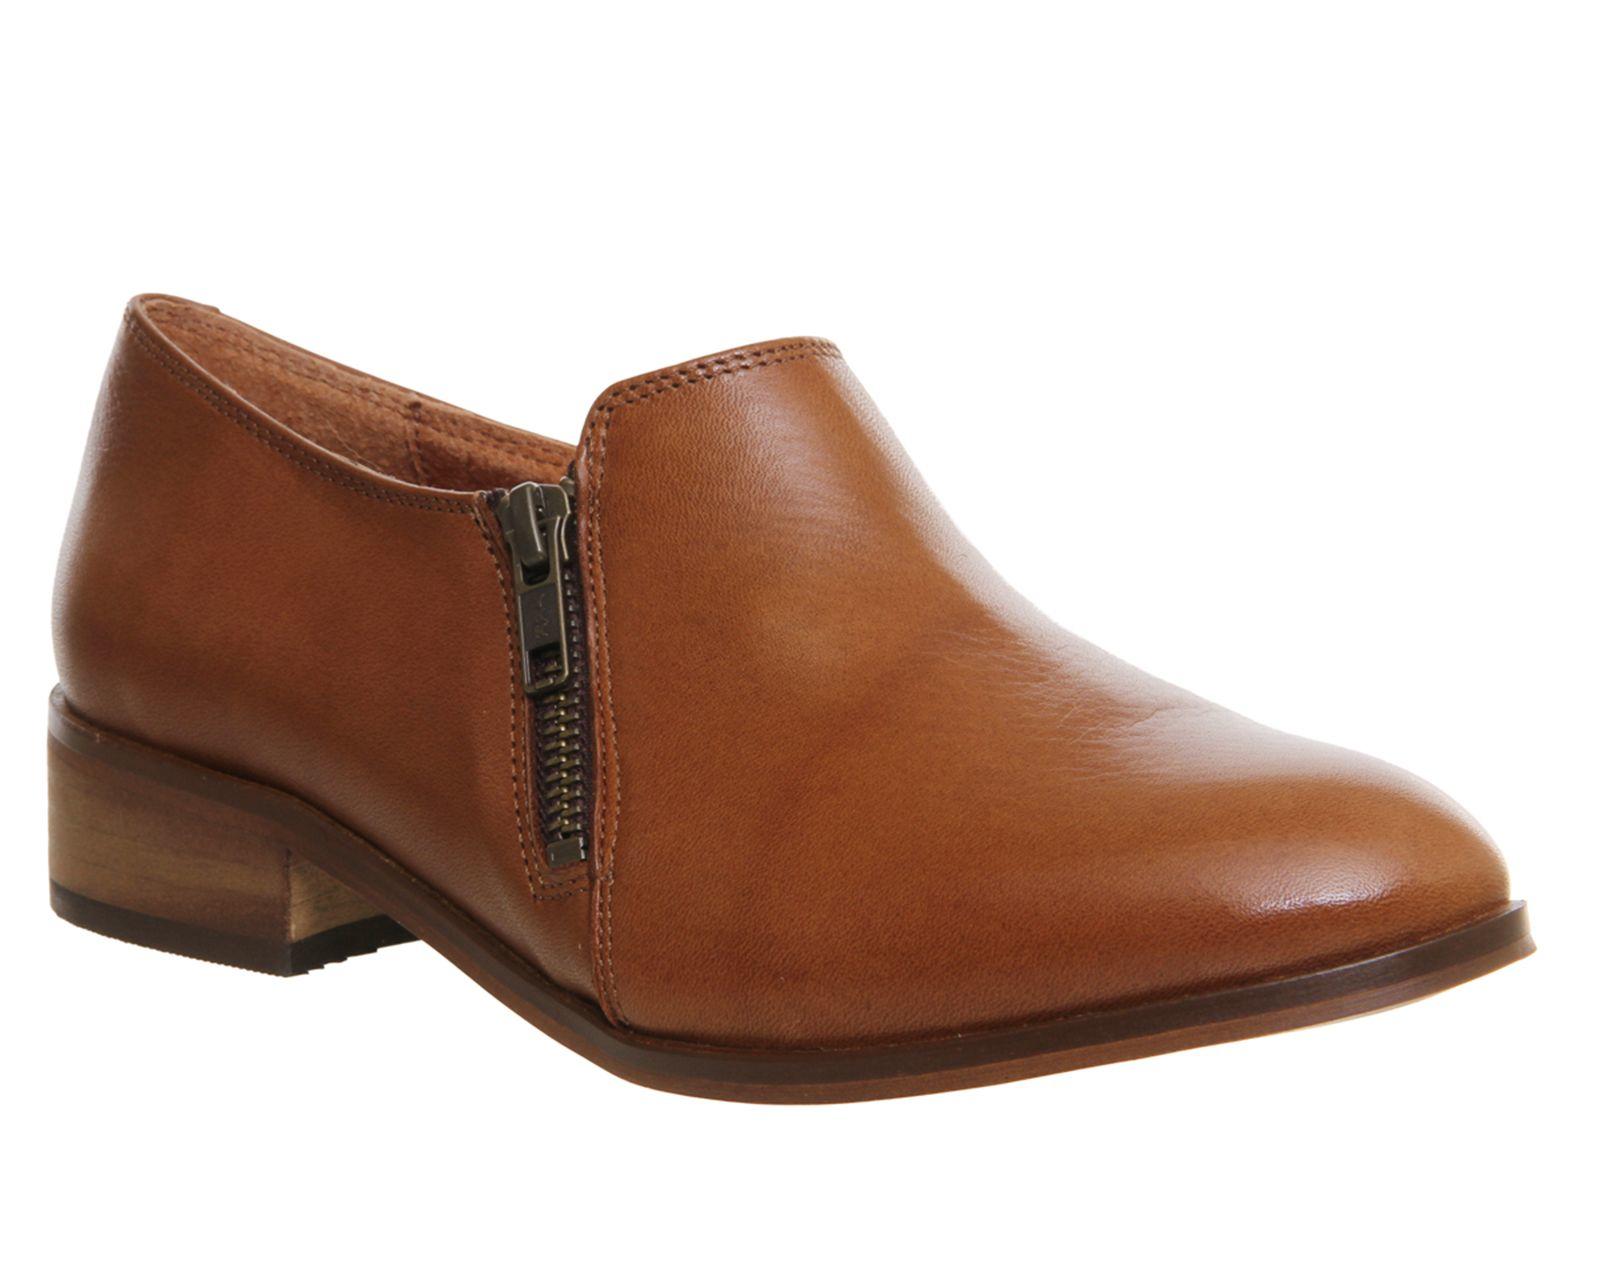 Office Shoes Lex Side Zip Flat